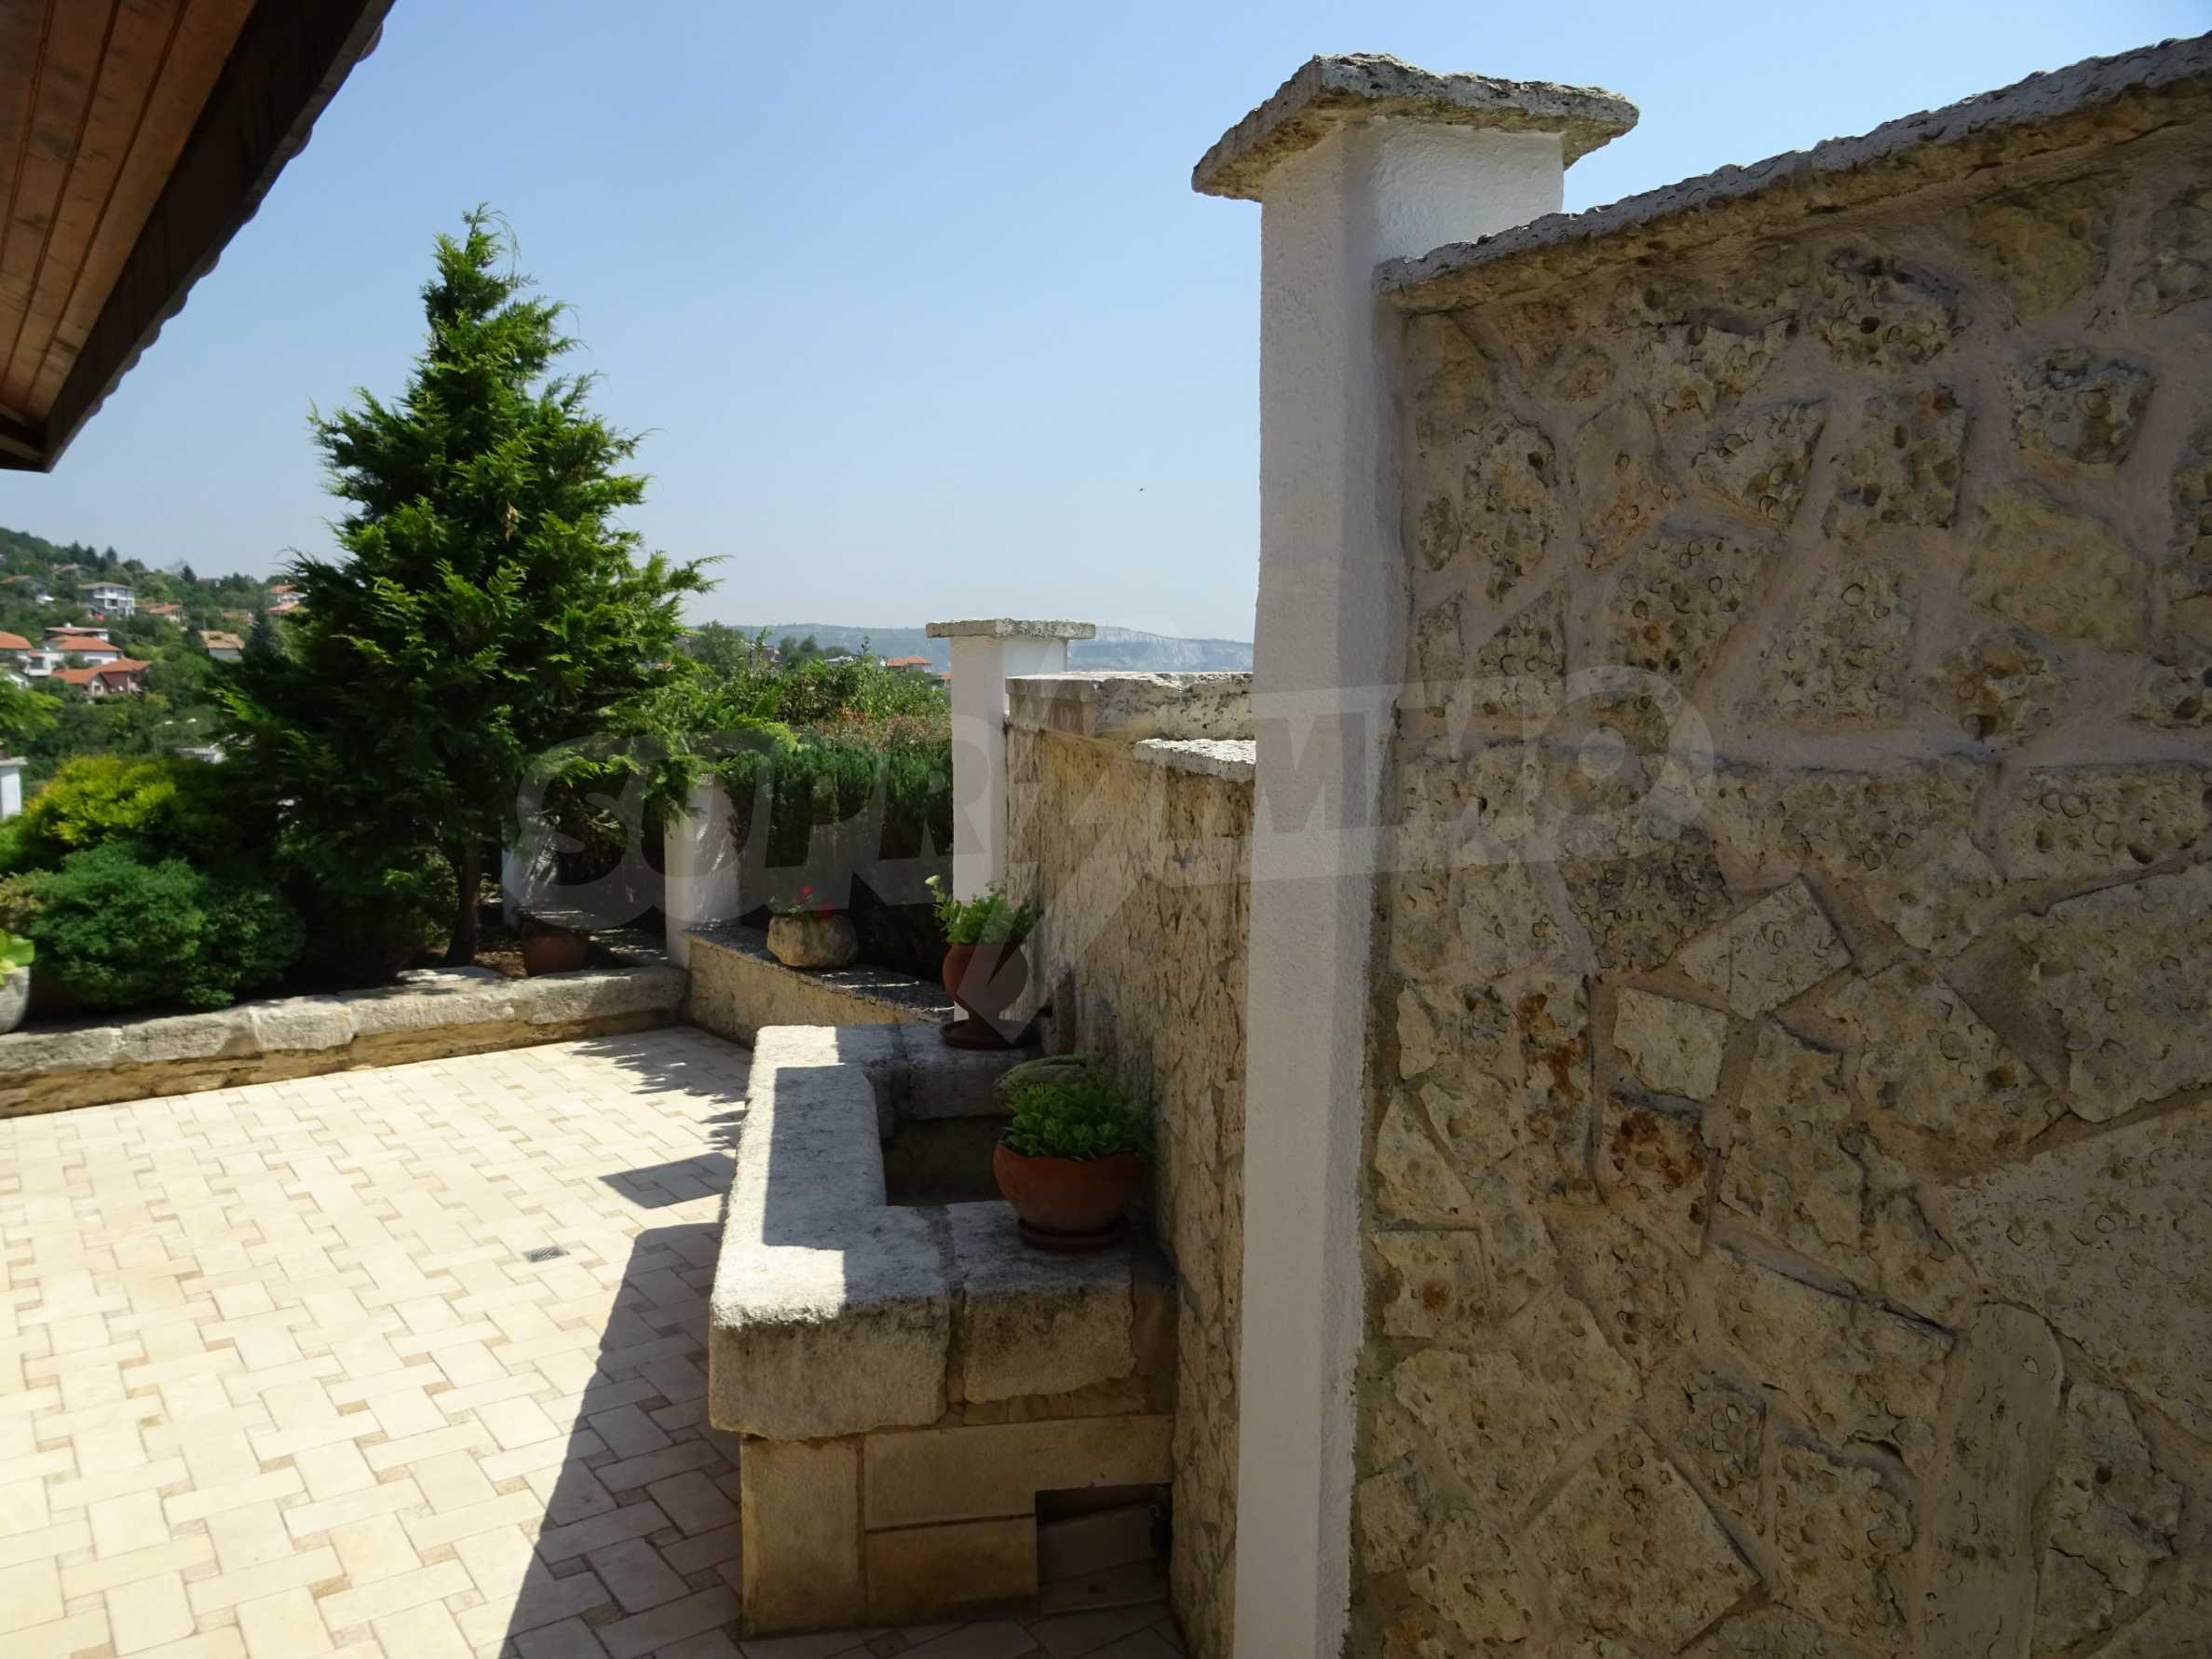 The Mediterranean style - a sense of luxury 67